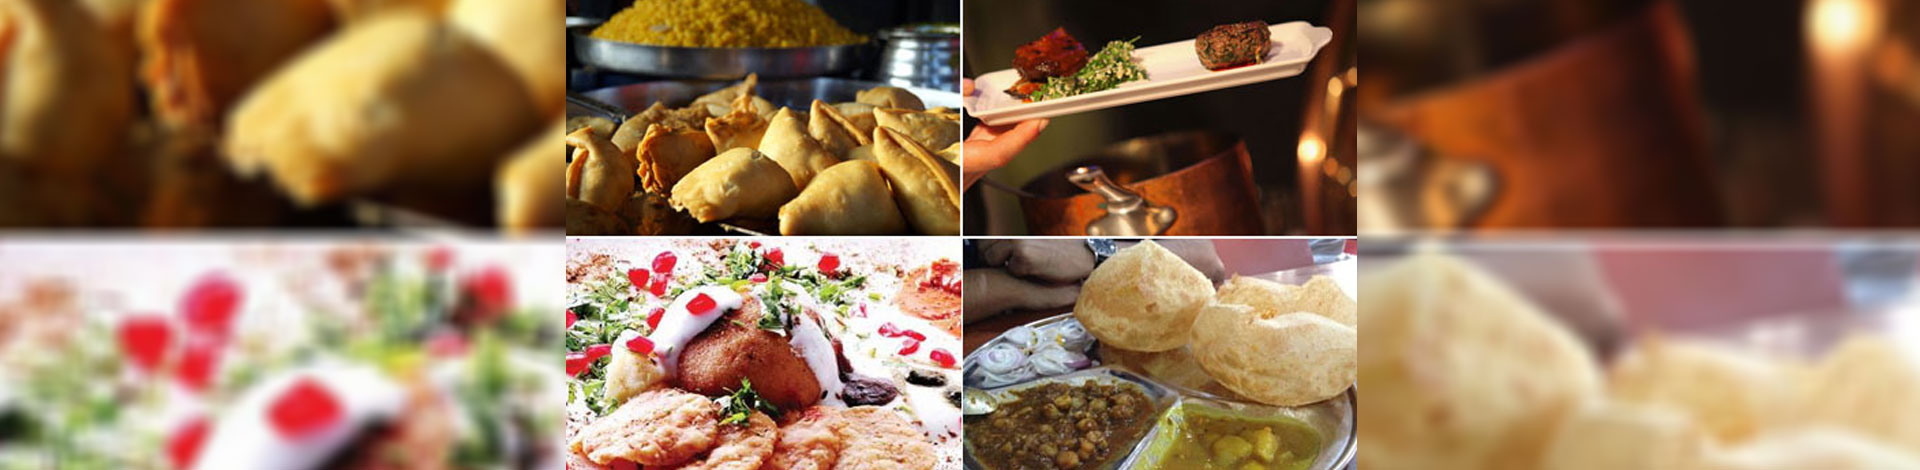 Old-delhi-street-food